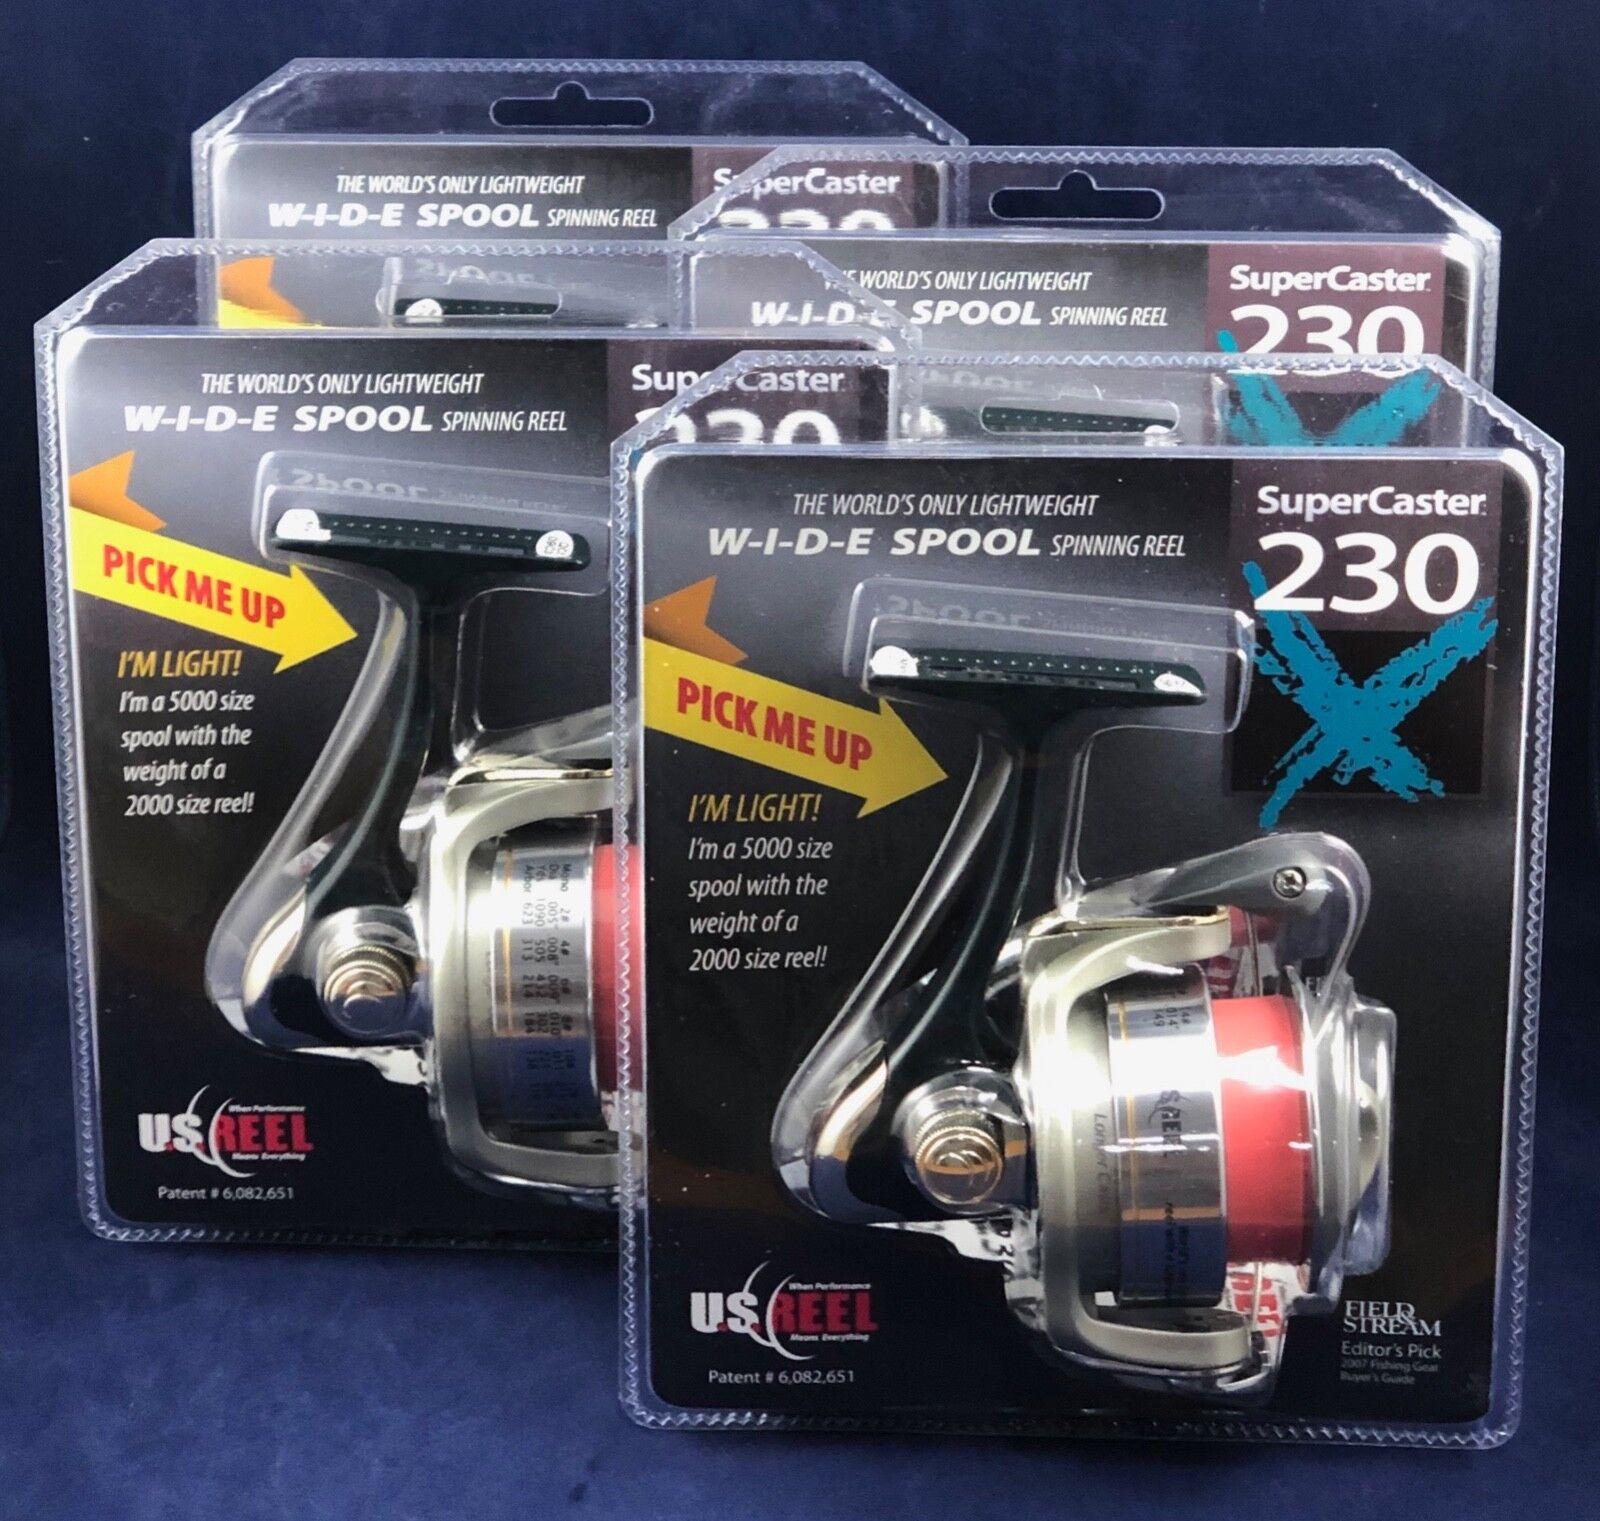 nuevo  U.S. Reel súpercaster 230X-Spinning Cocheretes-Field & Stream Pick-Lote de 4